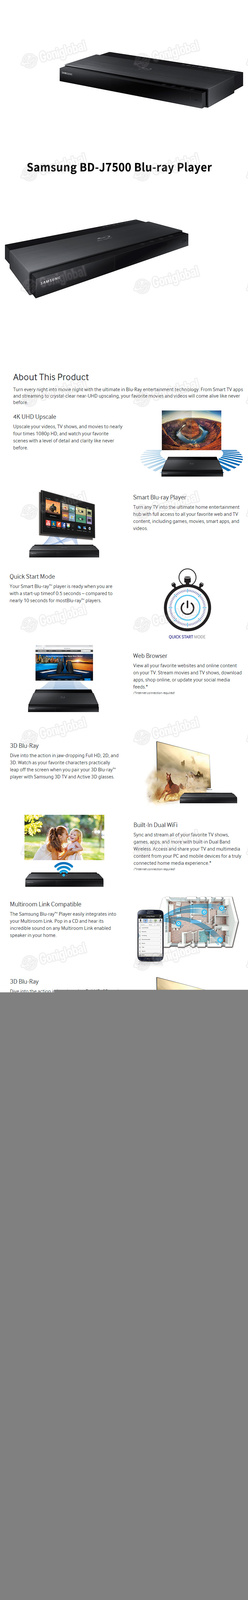 Samsung bd j7500